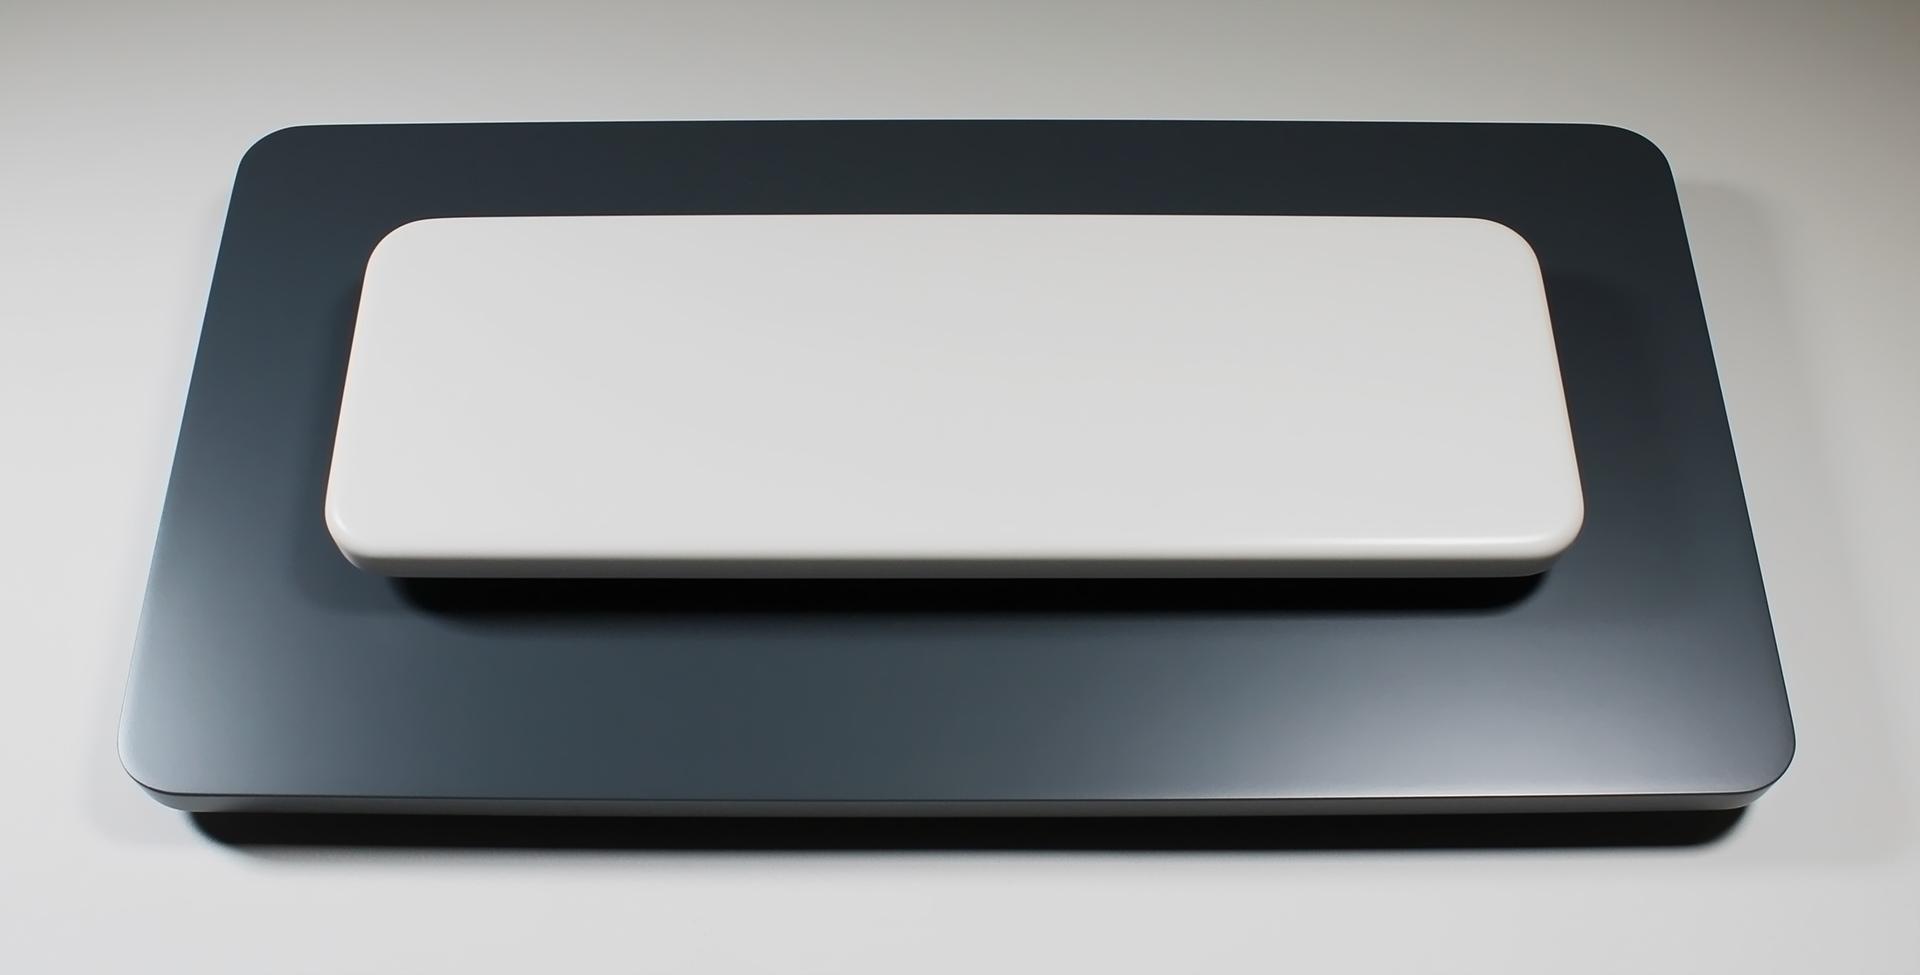 Solid Surface Stephen Wozniak